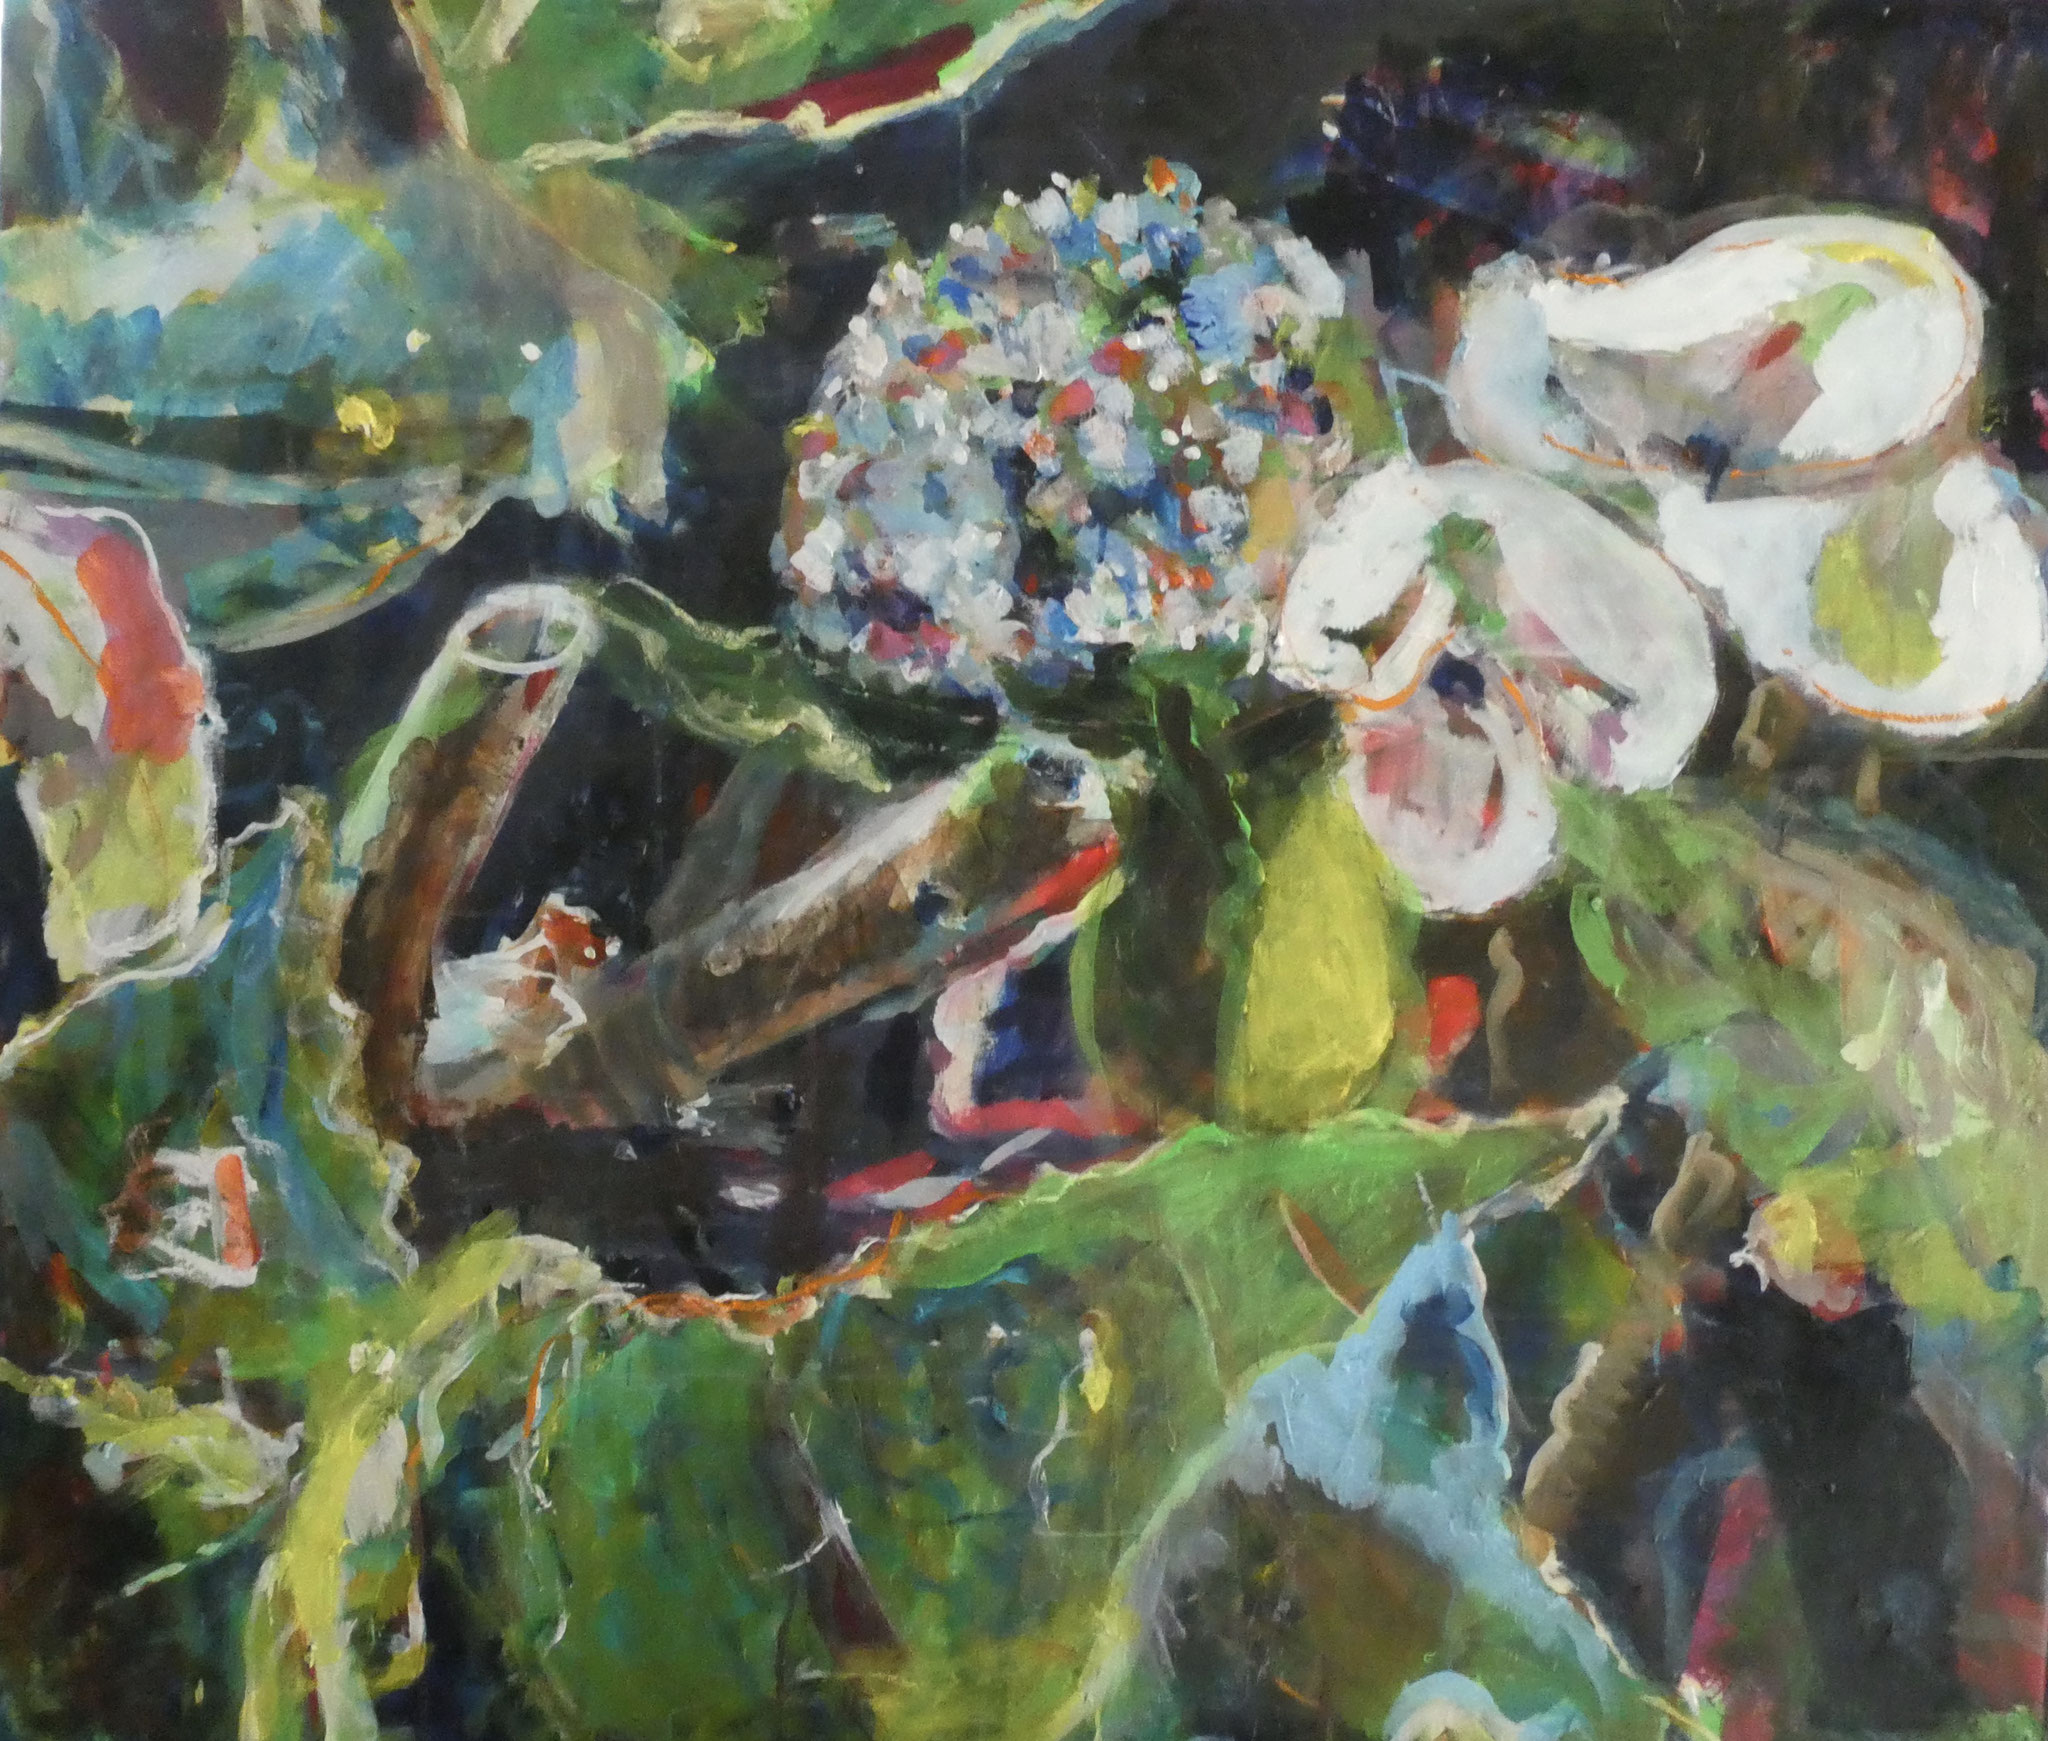 Hortensien 8,  95x110,  acrylic on canvas